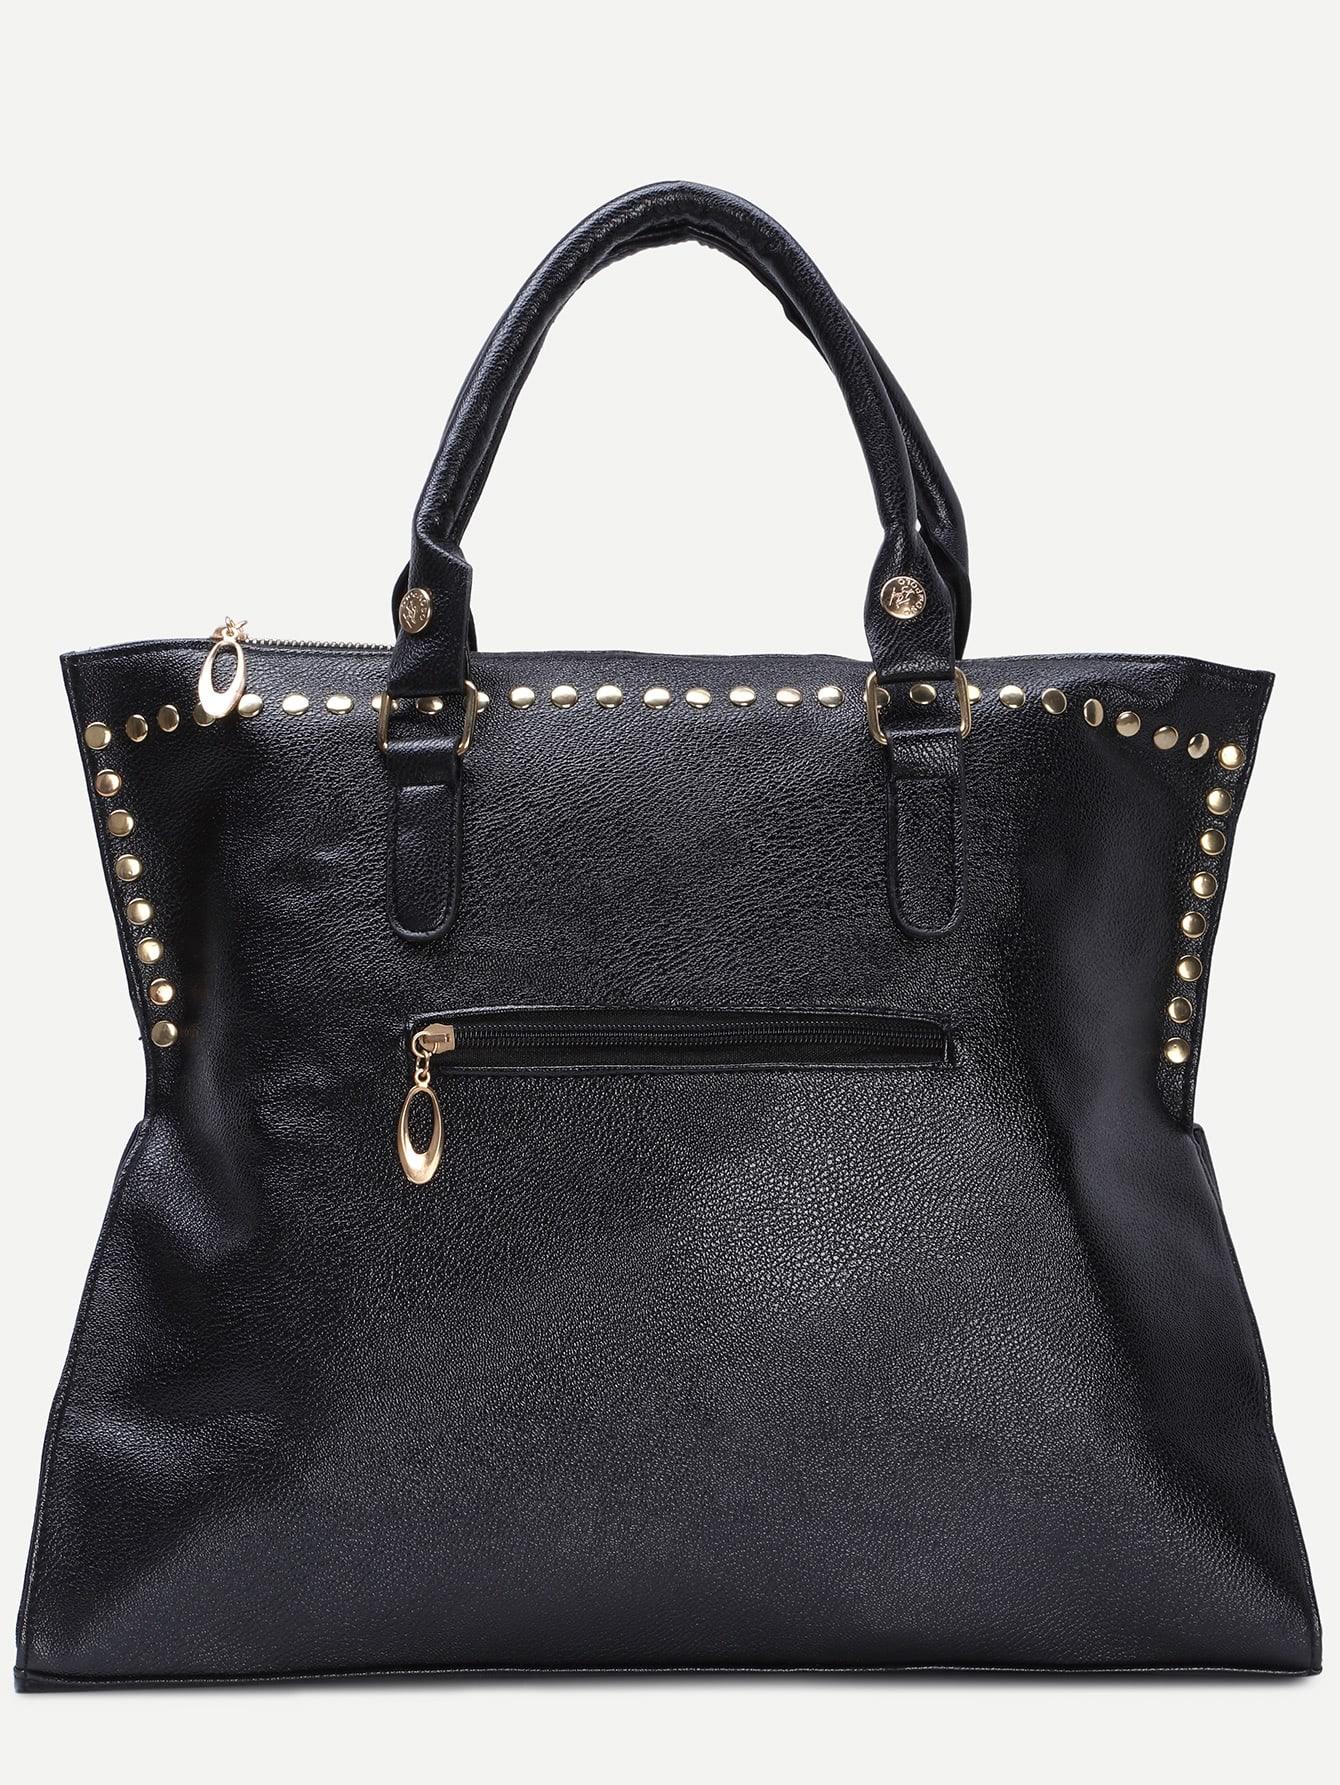 bag160816301_2